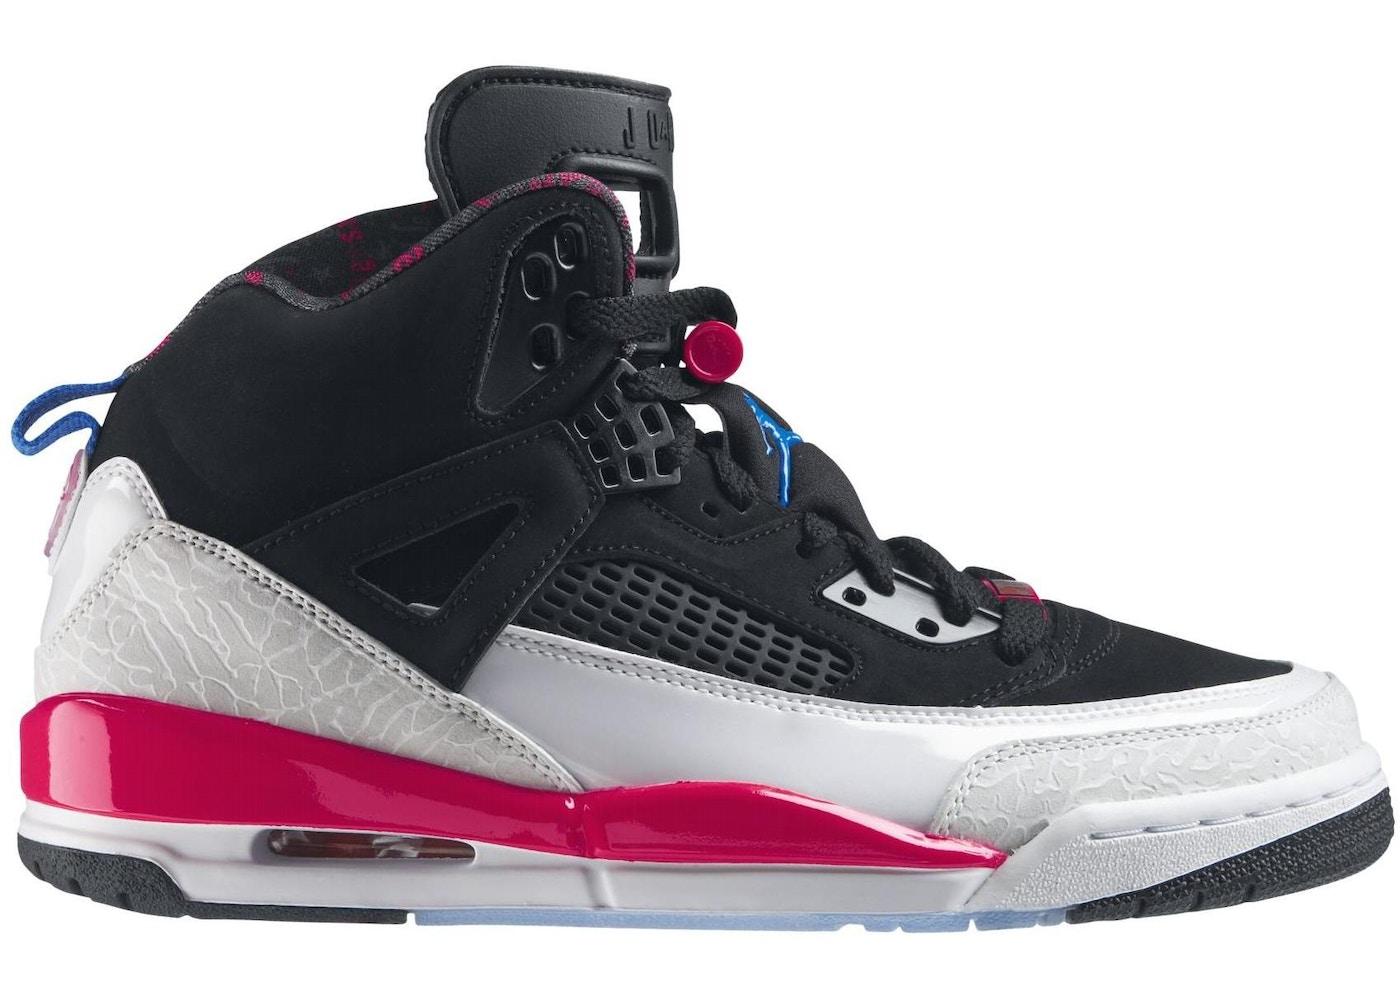 online retailer 2ff22 612a2 Air Jordan Spizike Size 9 Shoes - Average Sale Price